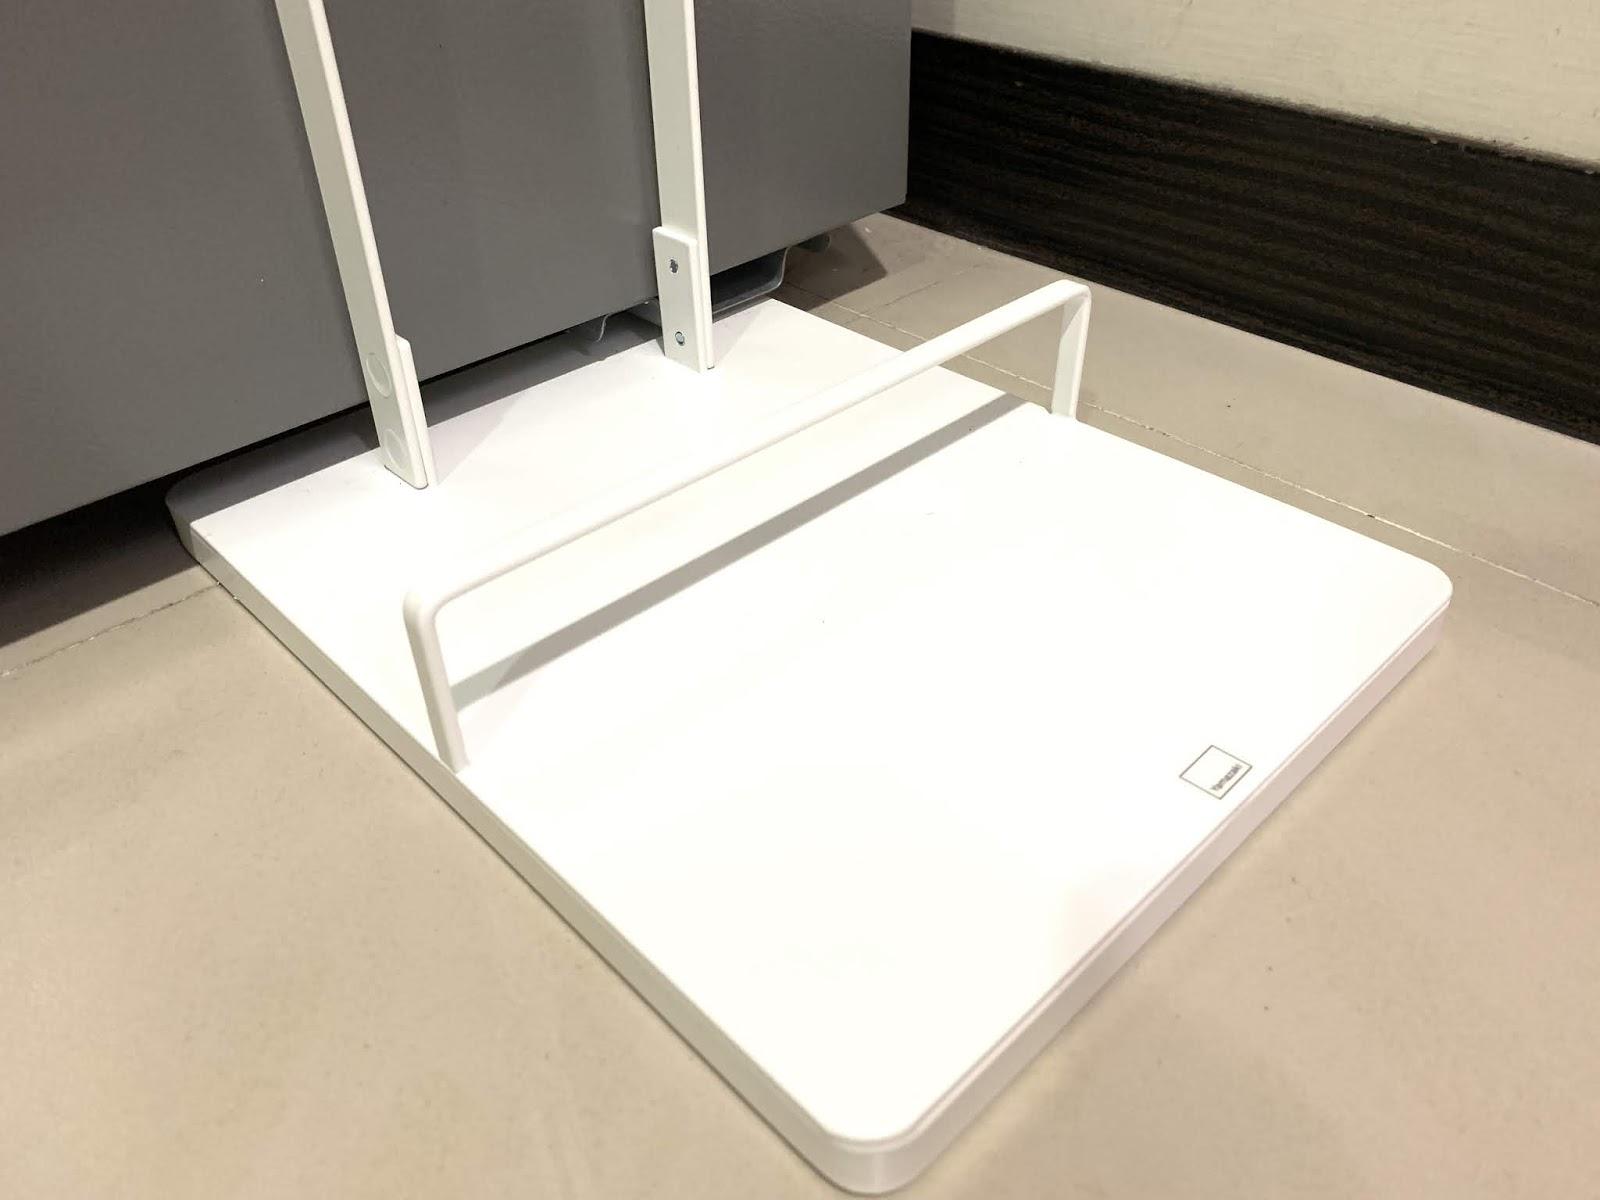 Plate多功能吸塵器收納架 山崎收納 YAMAZAKI 客廳收納 擋板設計 吸塵器收納 吸塵器架